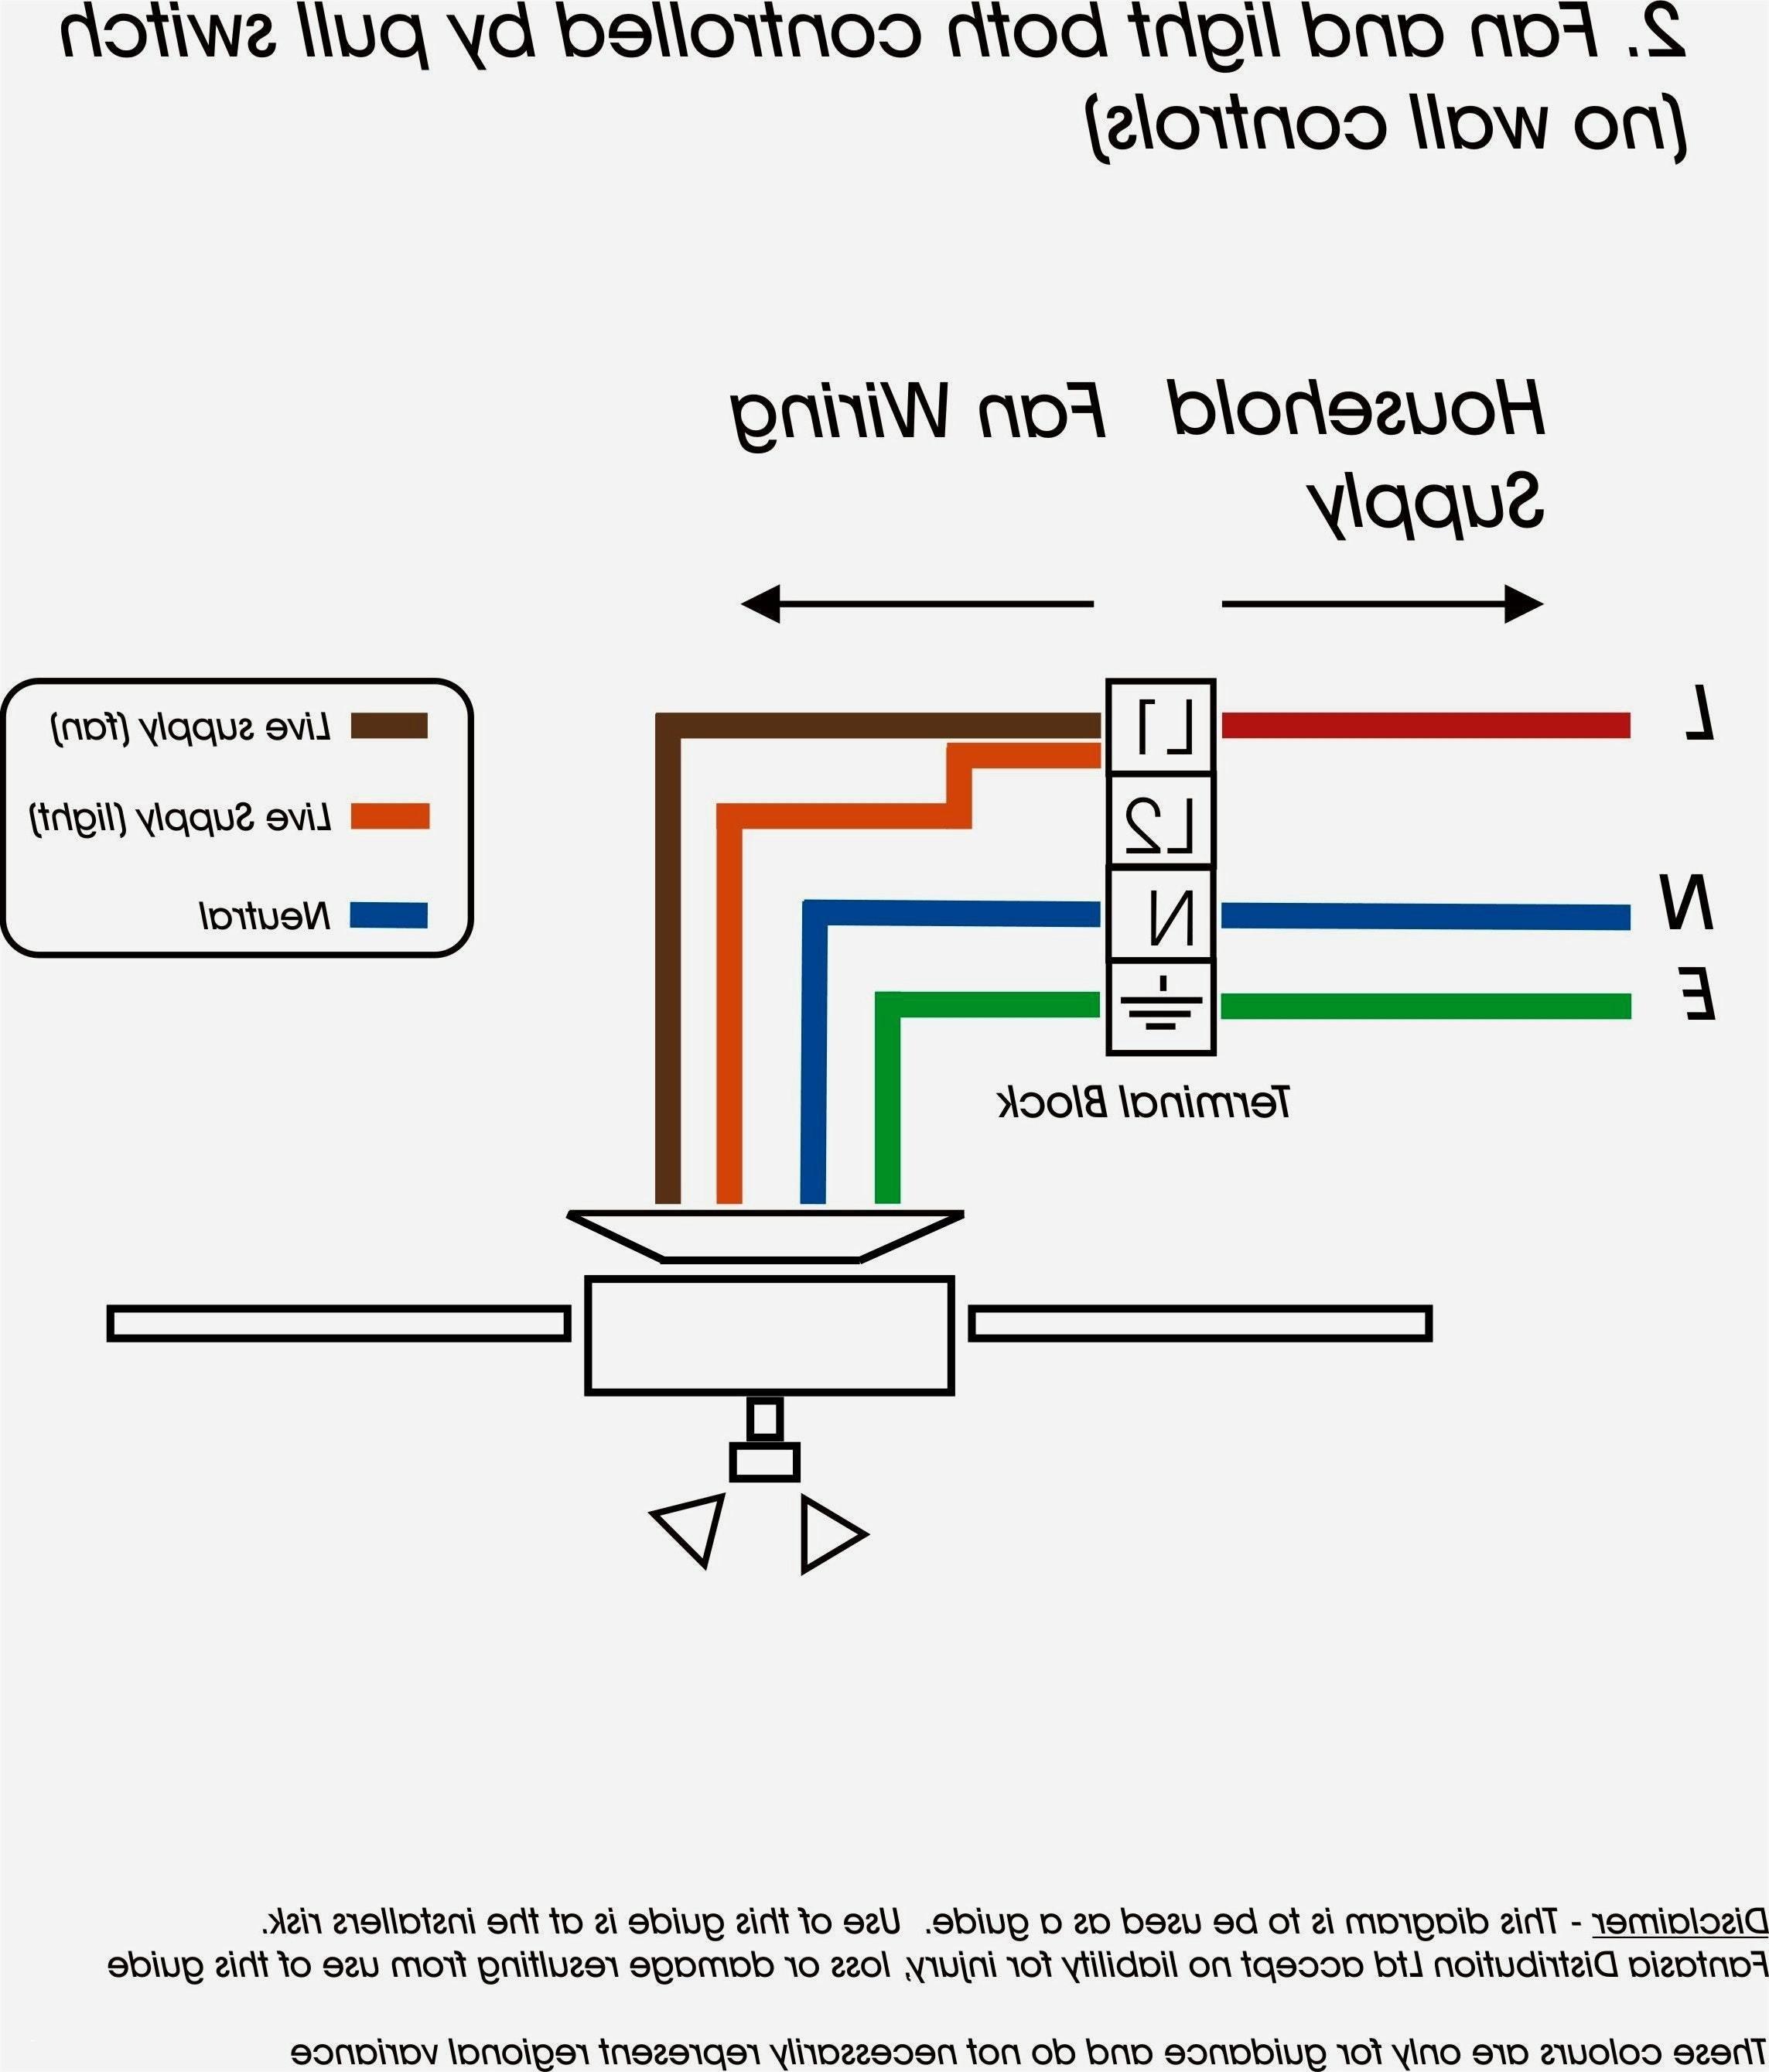 lighted rocker switch wiring diagram 120v Collection-Rocker Switch Wiring Diagram New Led toggle Switch Wiring Diagram Lighted Rocker Switch Wiring Diagram 120v 13-k